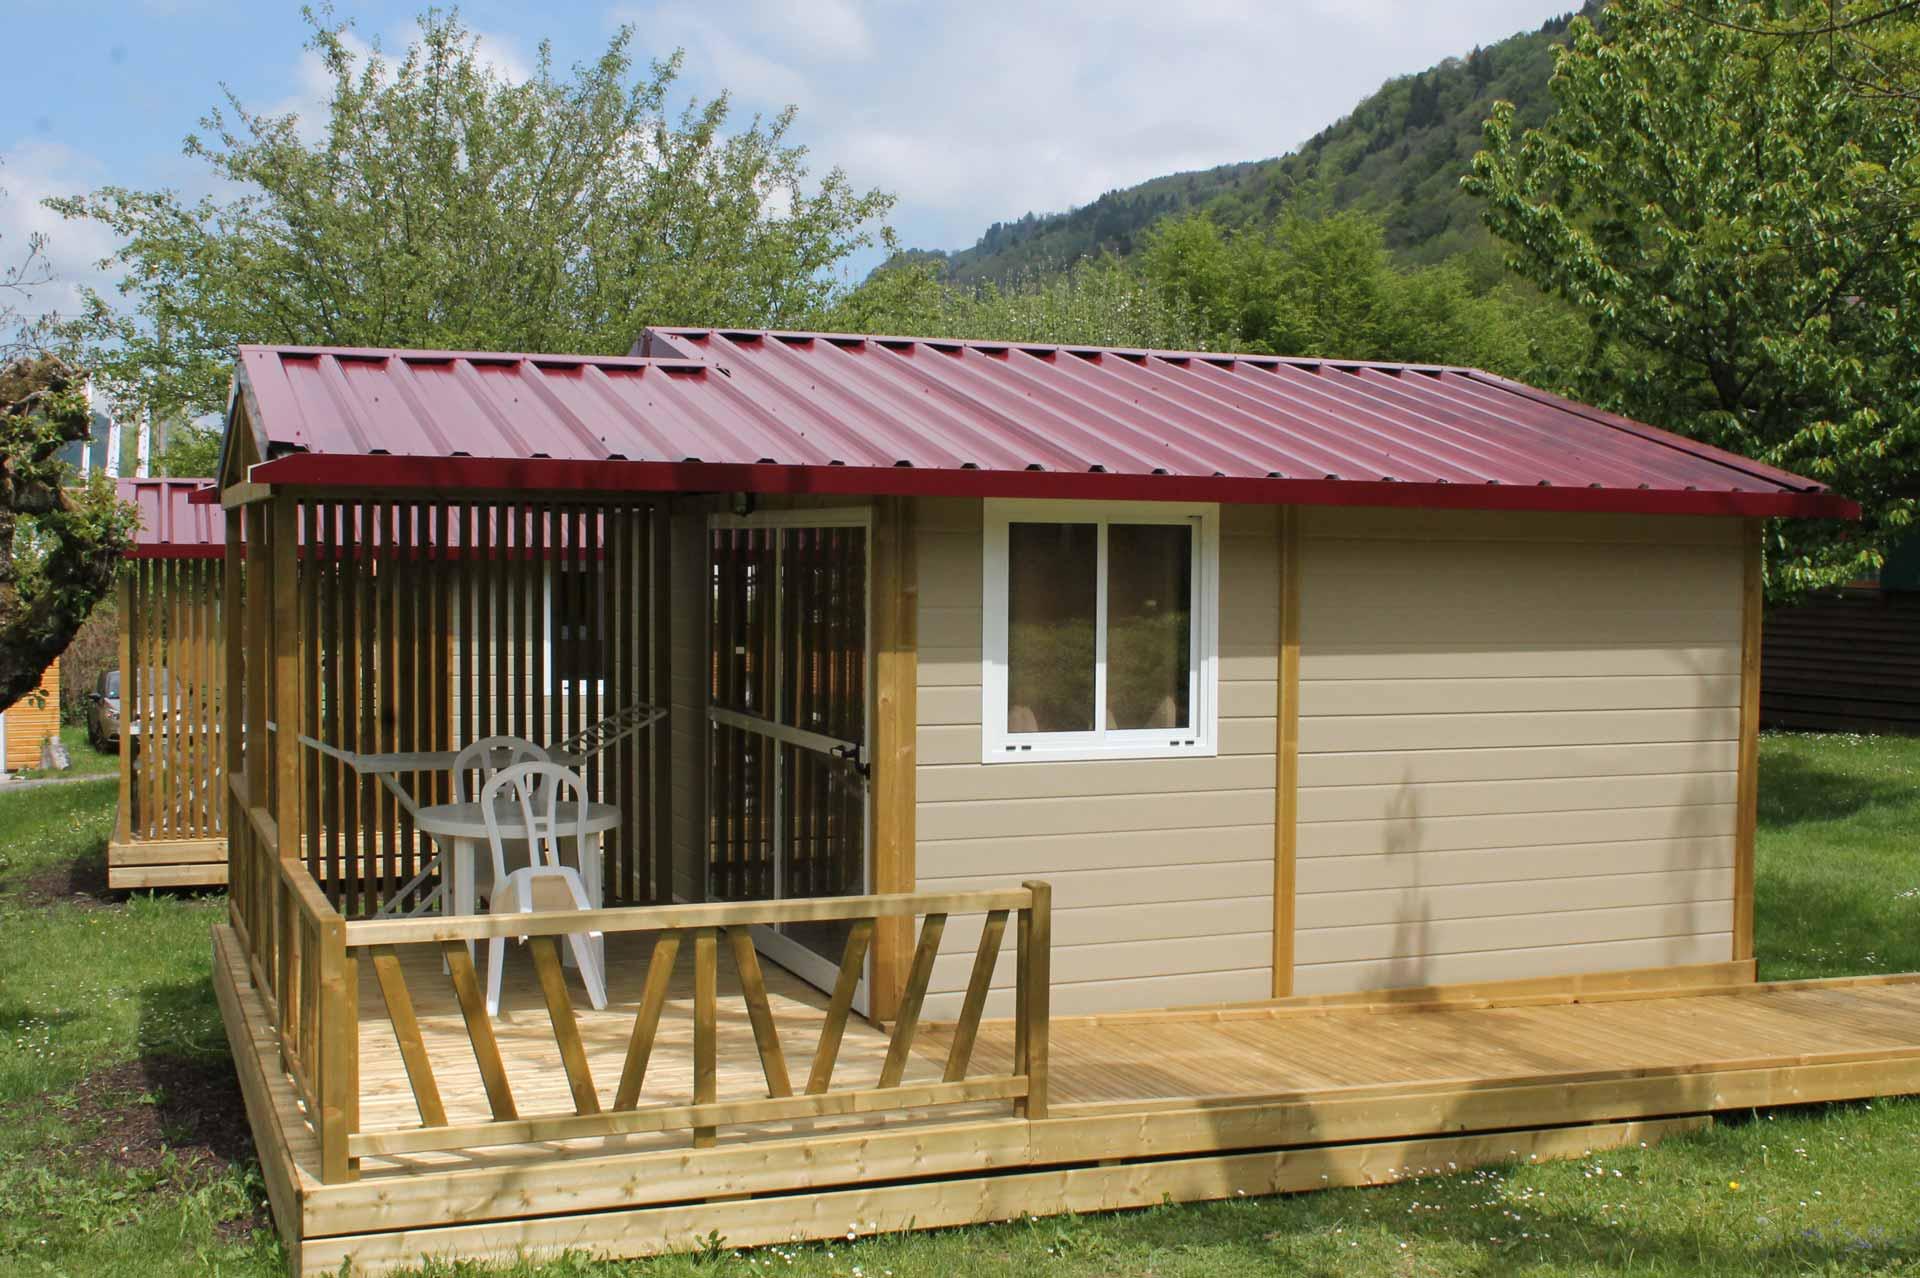 NEMO ideal camping allevard 38